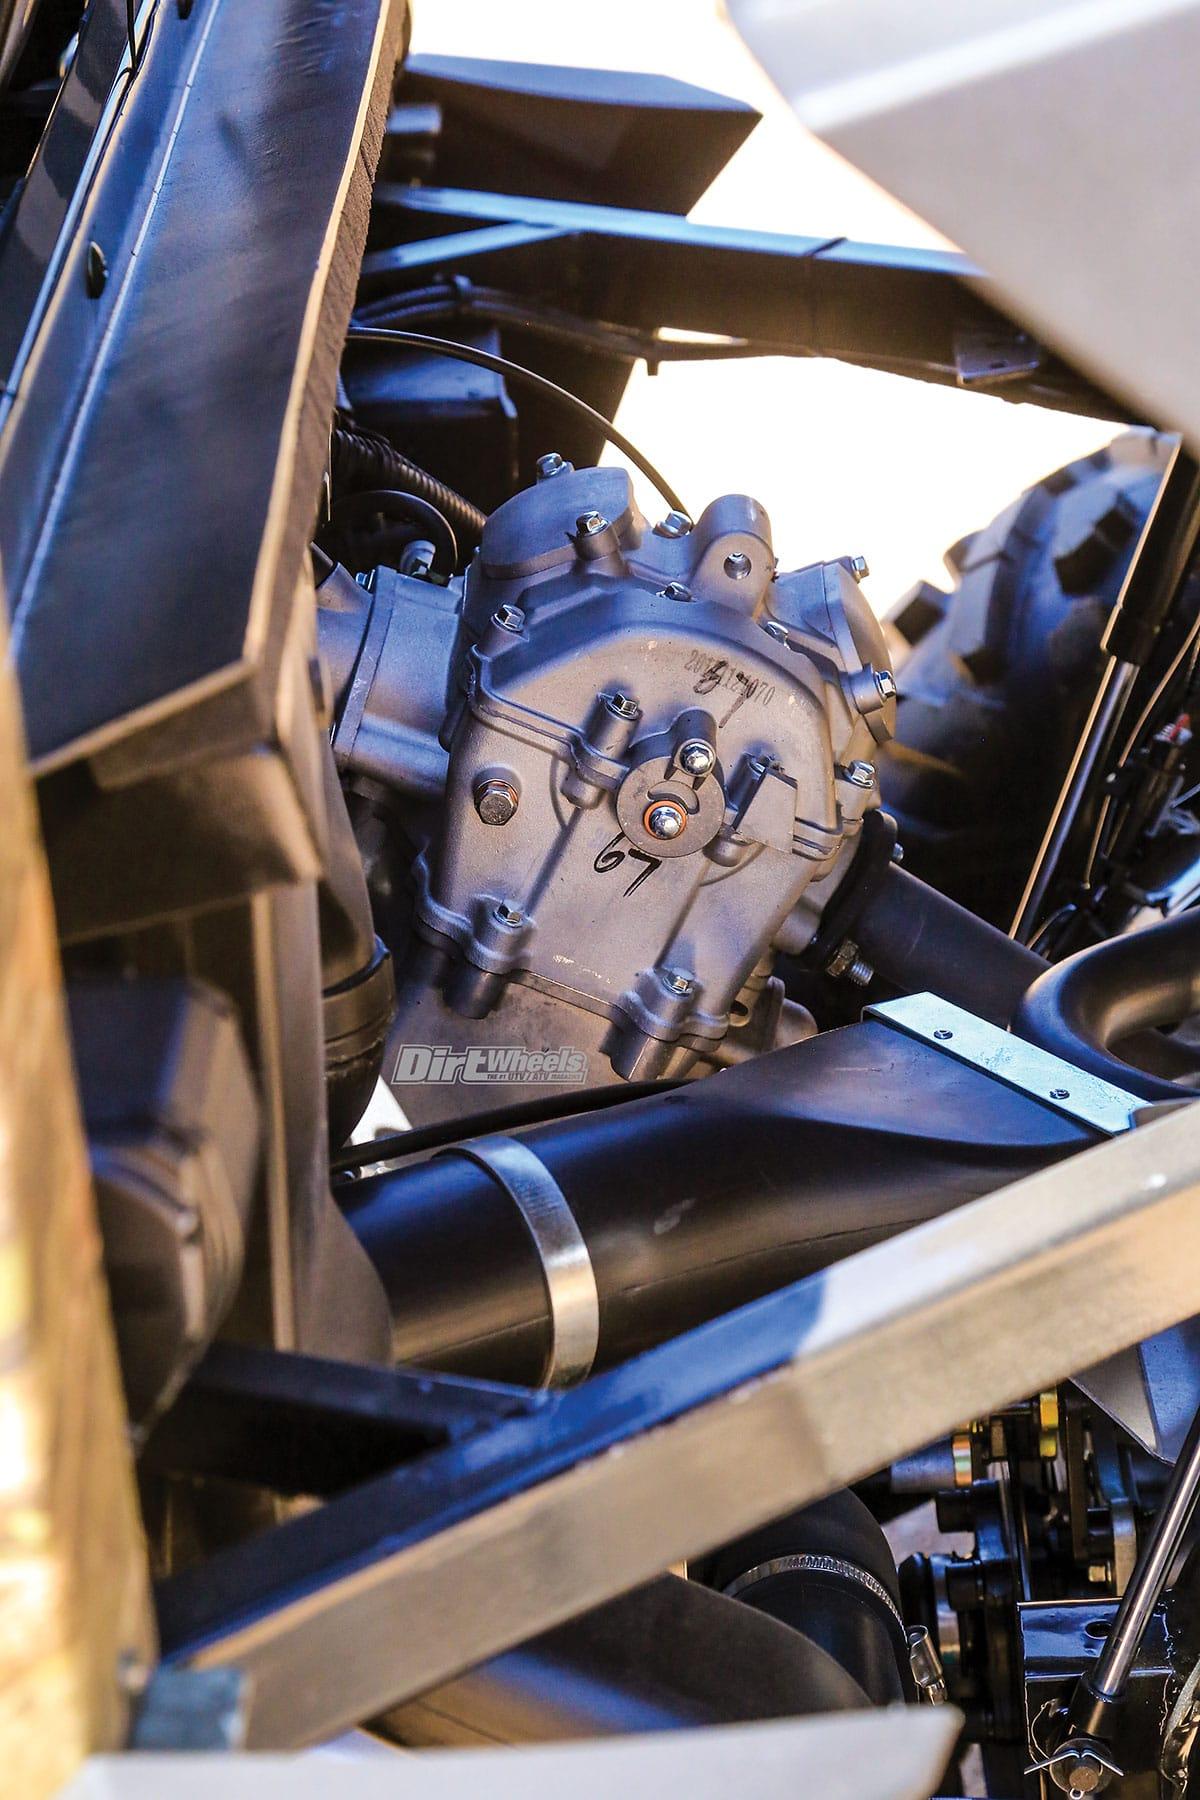 MASSIMO T-BOSS 550 TEST | Dirt Wheels Magazine